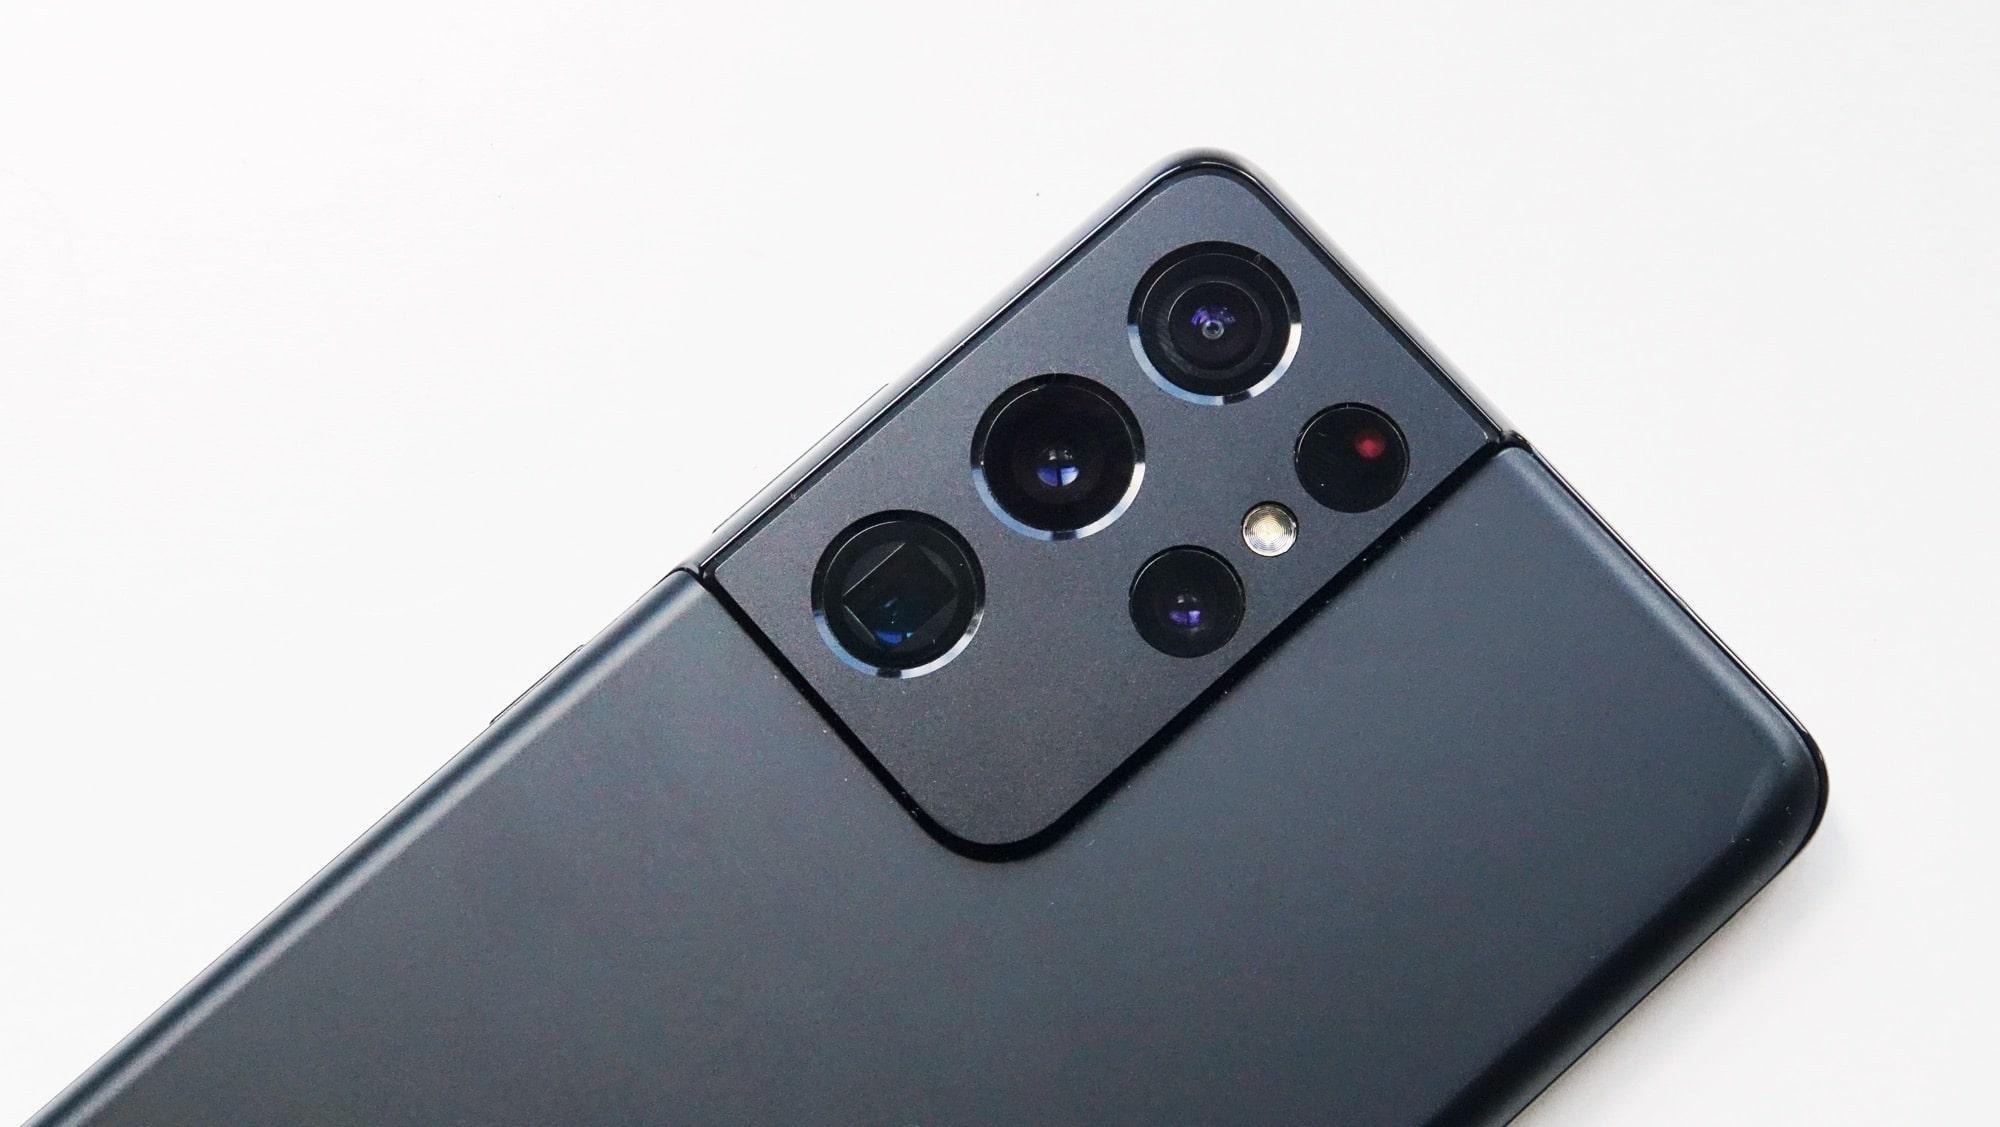 Samsung Galaxy S21 Ultra 5G camera